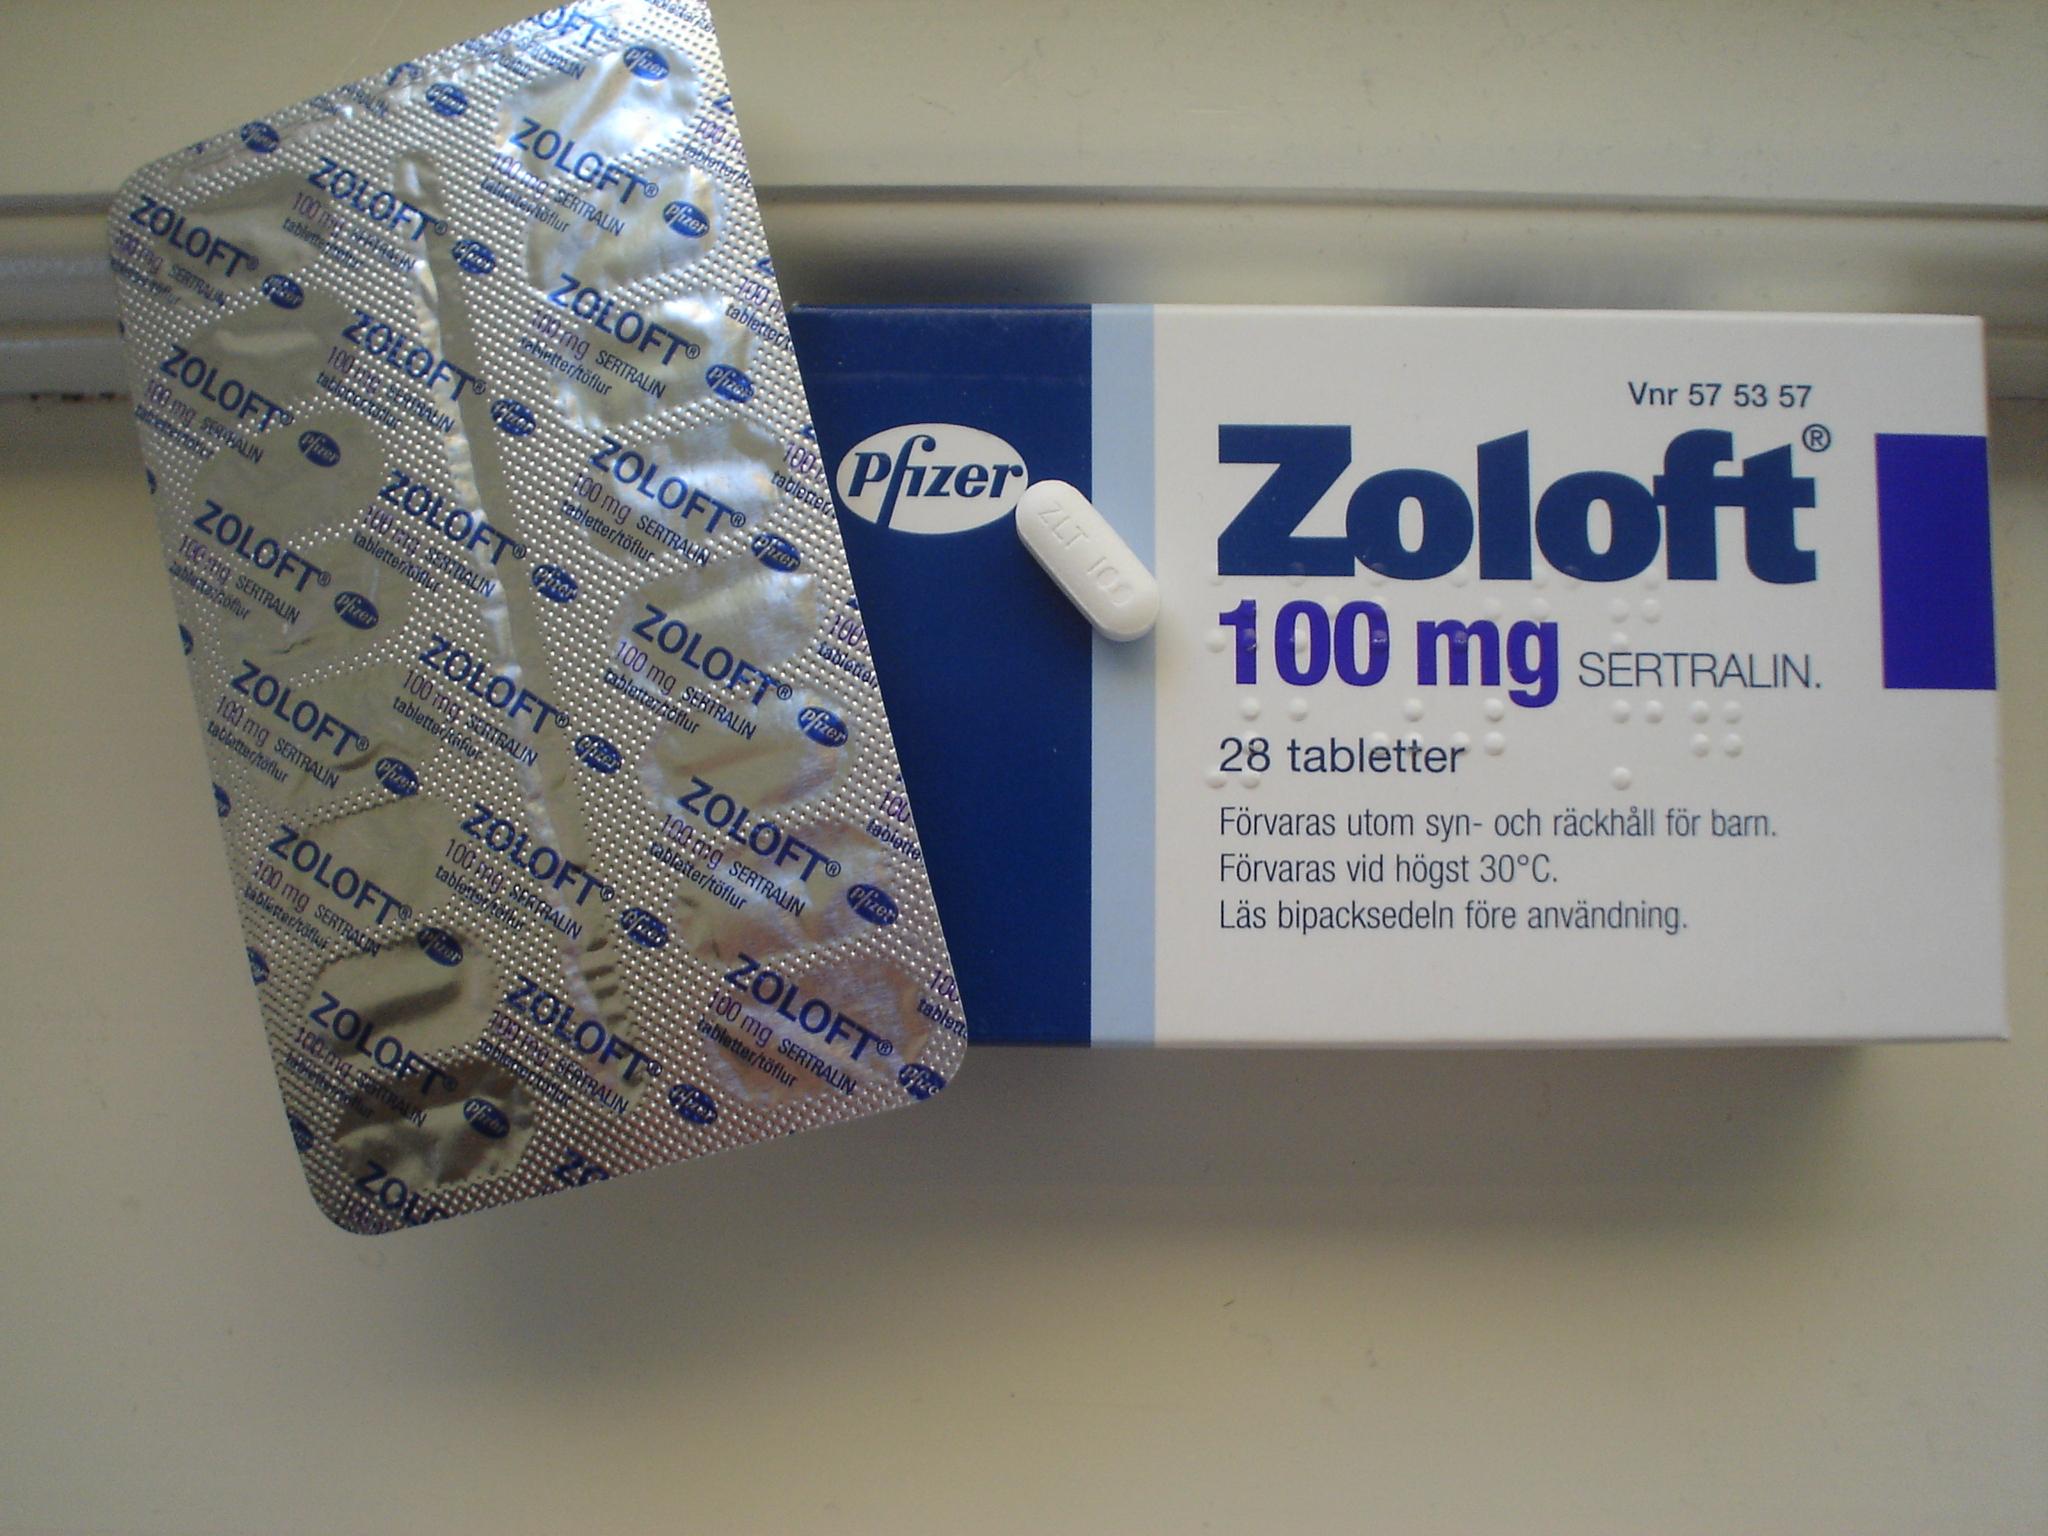 File:ZOLOFT (sertraline HCI).JPG - Wikimedia Commons